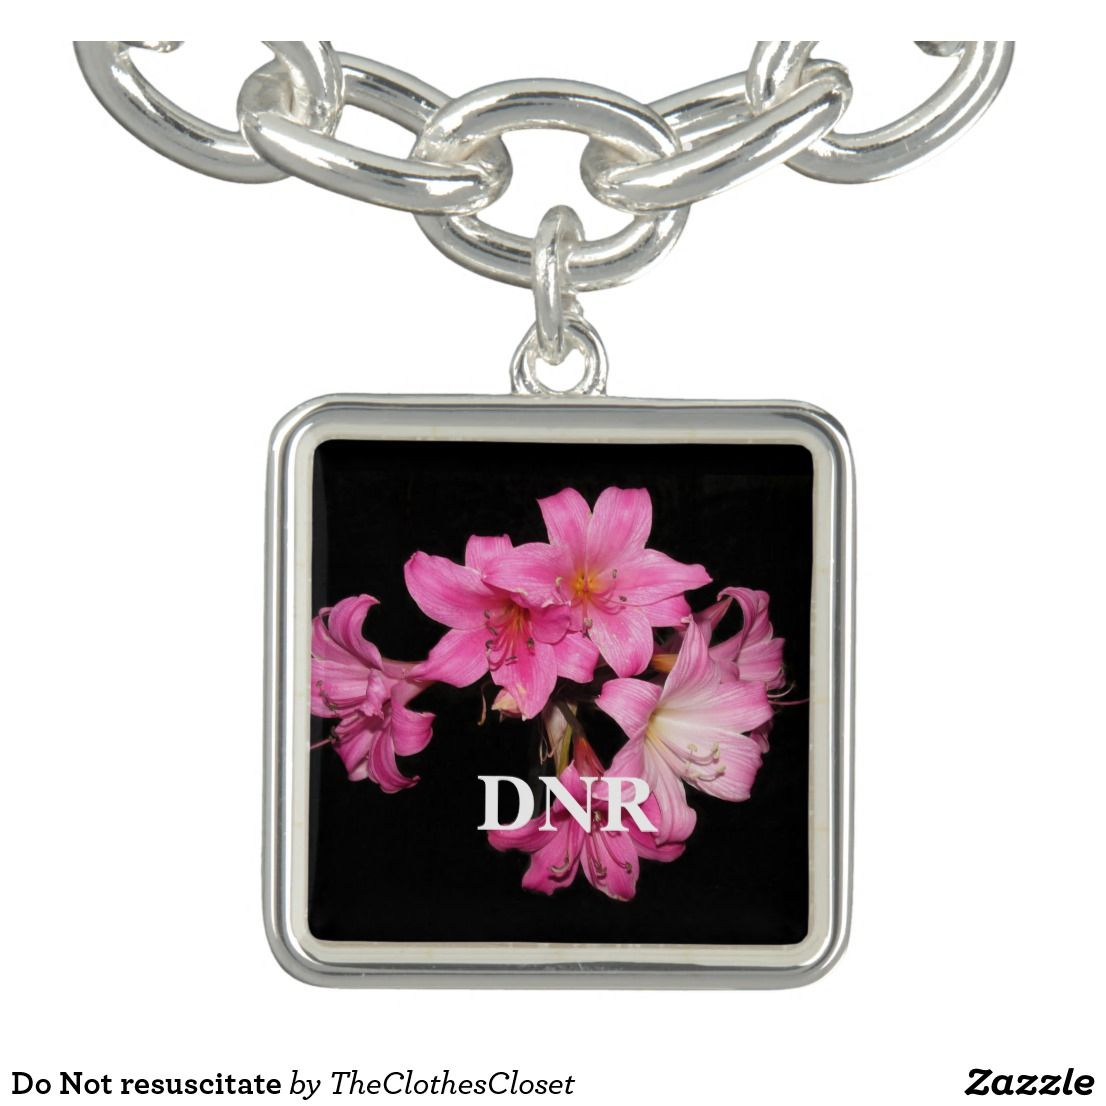 Do Not Resuscitate Bracelet Regalos Encantos Lindos Diseños De Flores Pulseras Amuleto